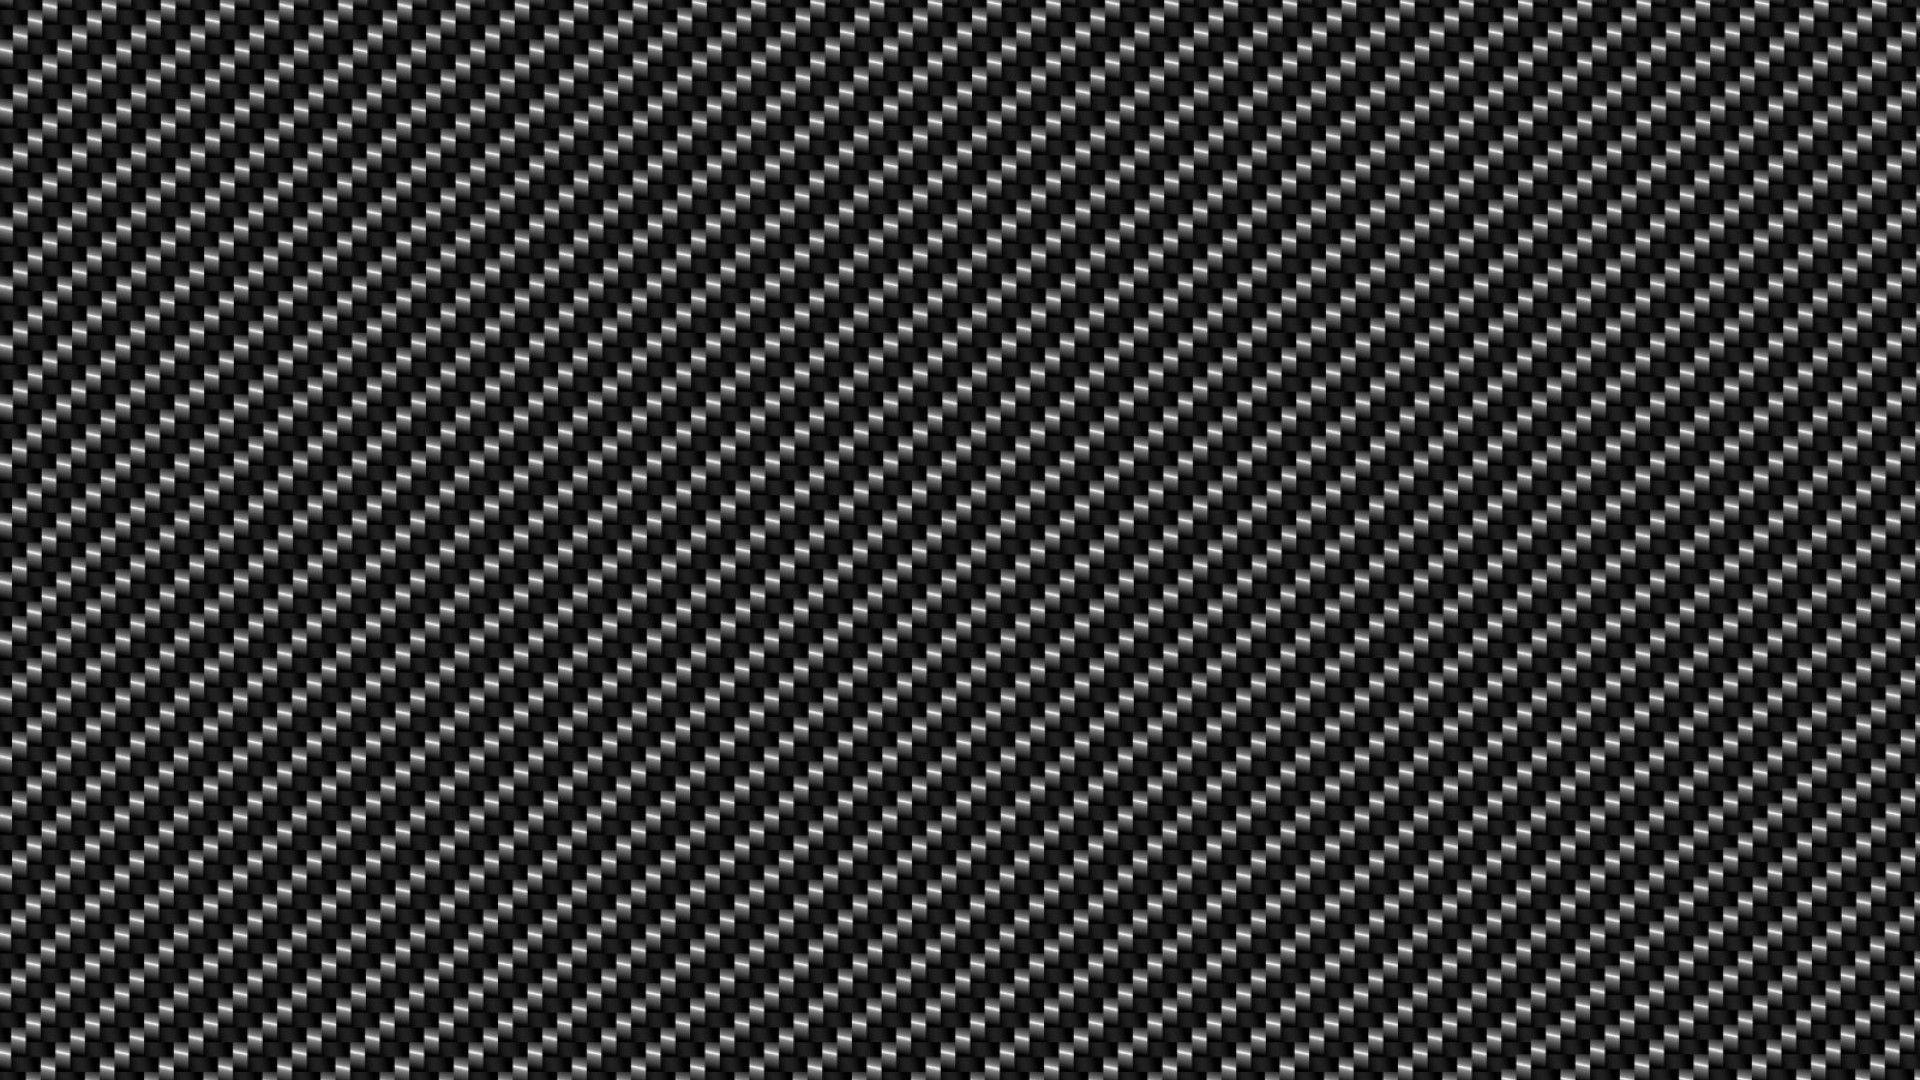 Silver Carbon Fiber Wallpapers 1080p